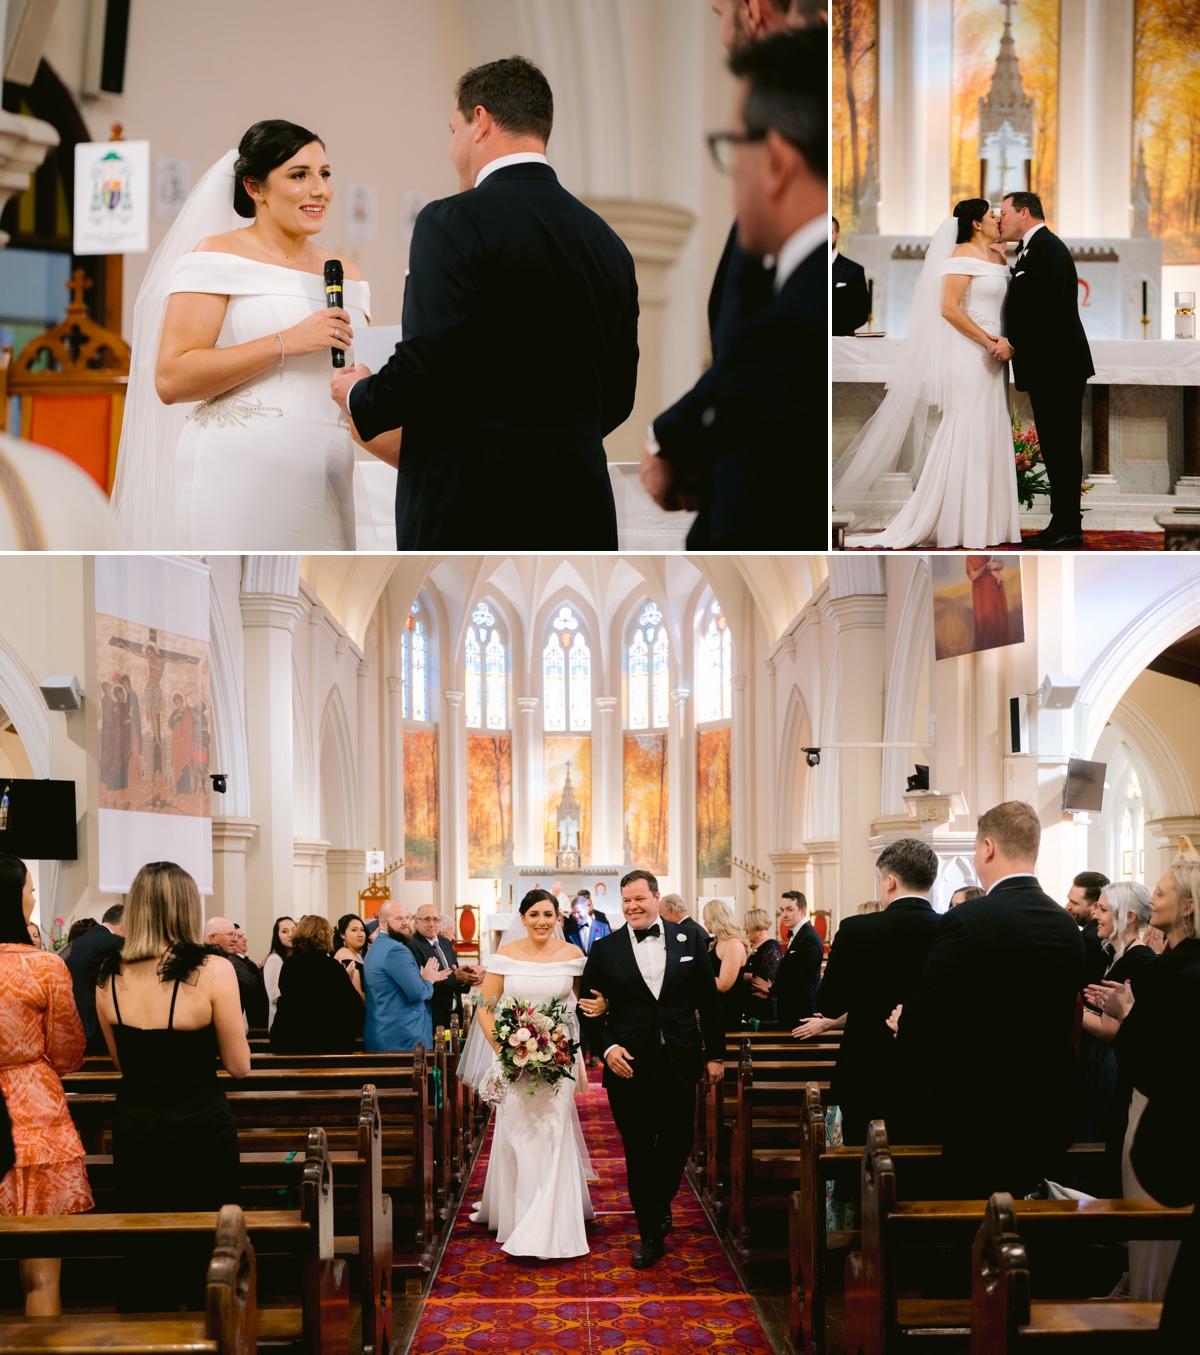 St. Patrick's cathedral toowoomba wedding www.benandhopeweddings.com.au